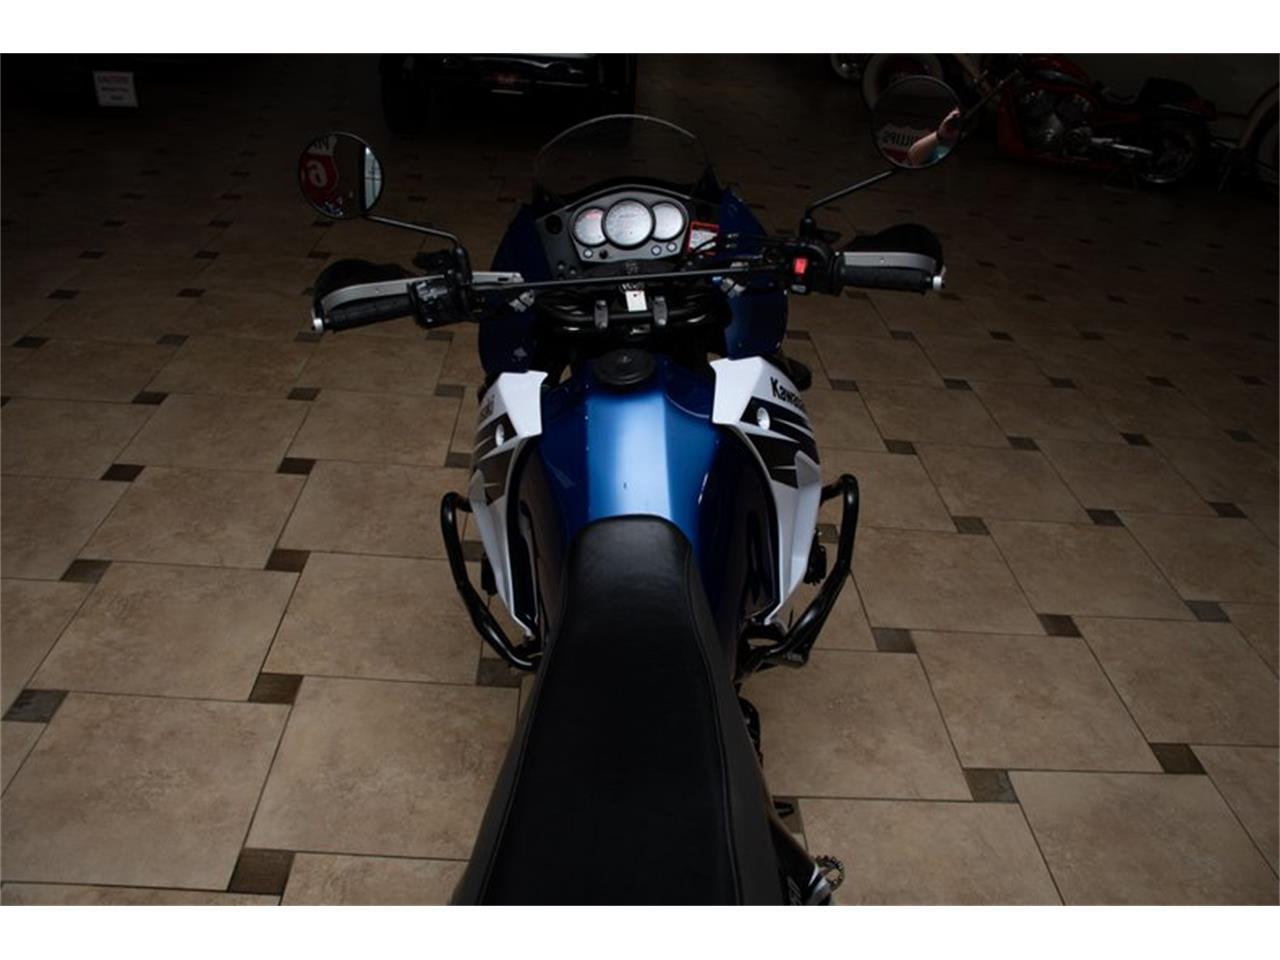 2012 Kawasaki Motorcycle (CC-1391356) for sale in Venice, Florida